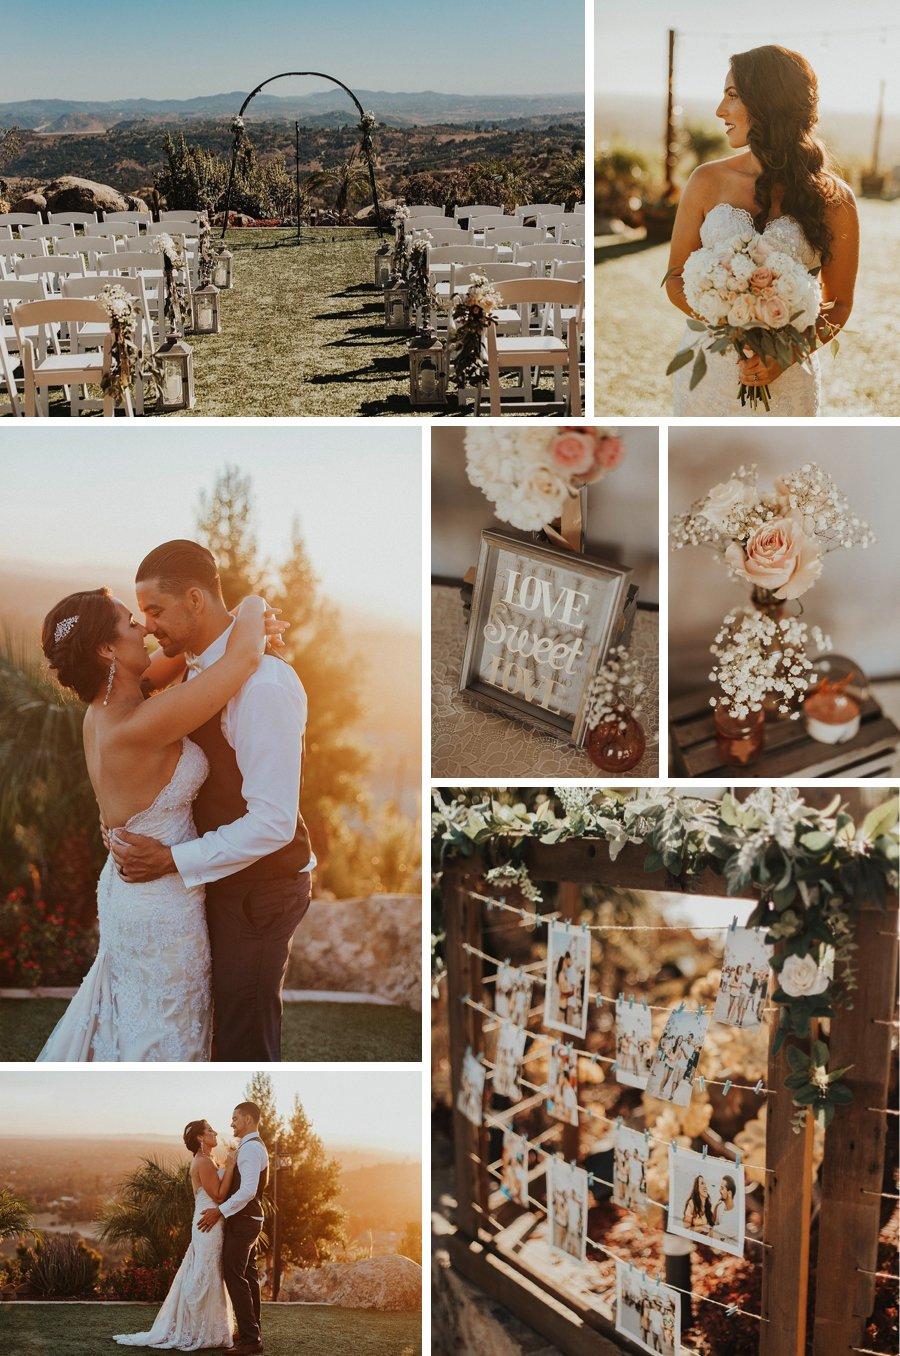 Real wedding: Californian hilltop and tacos